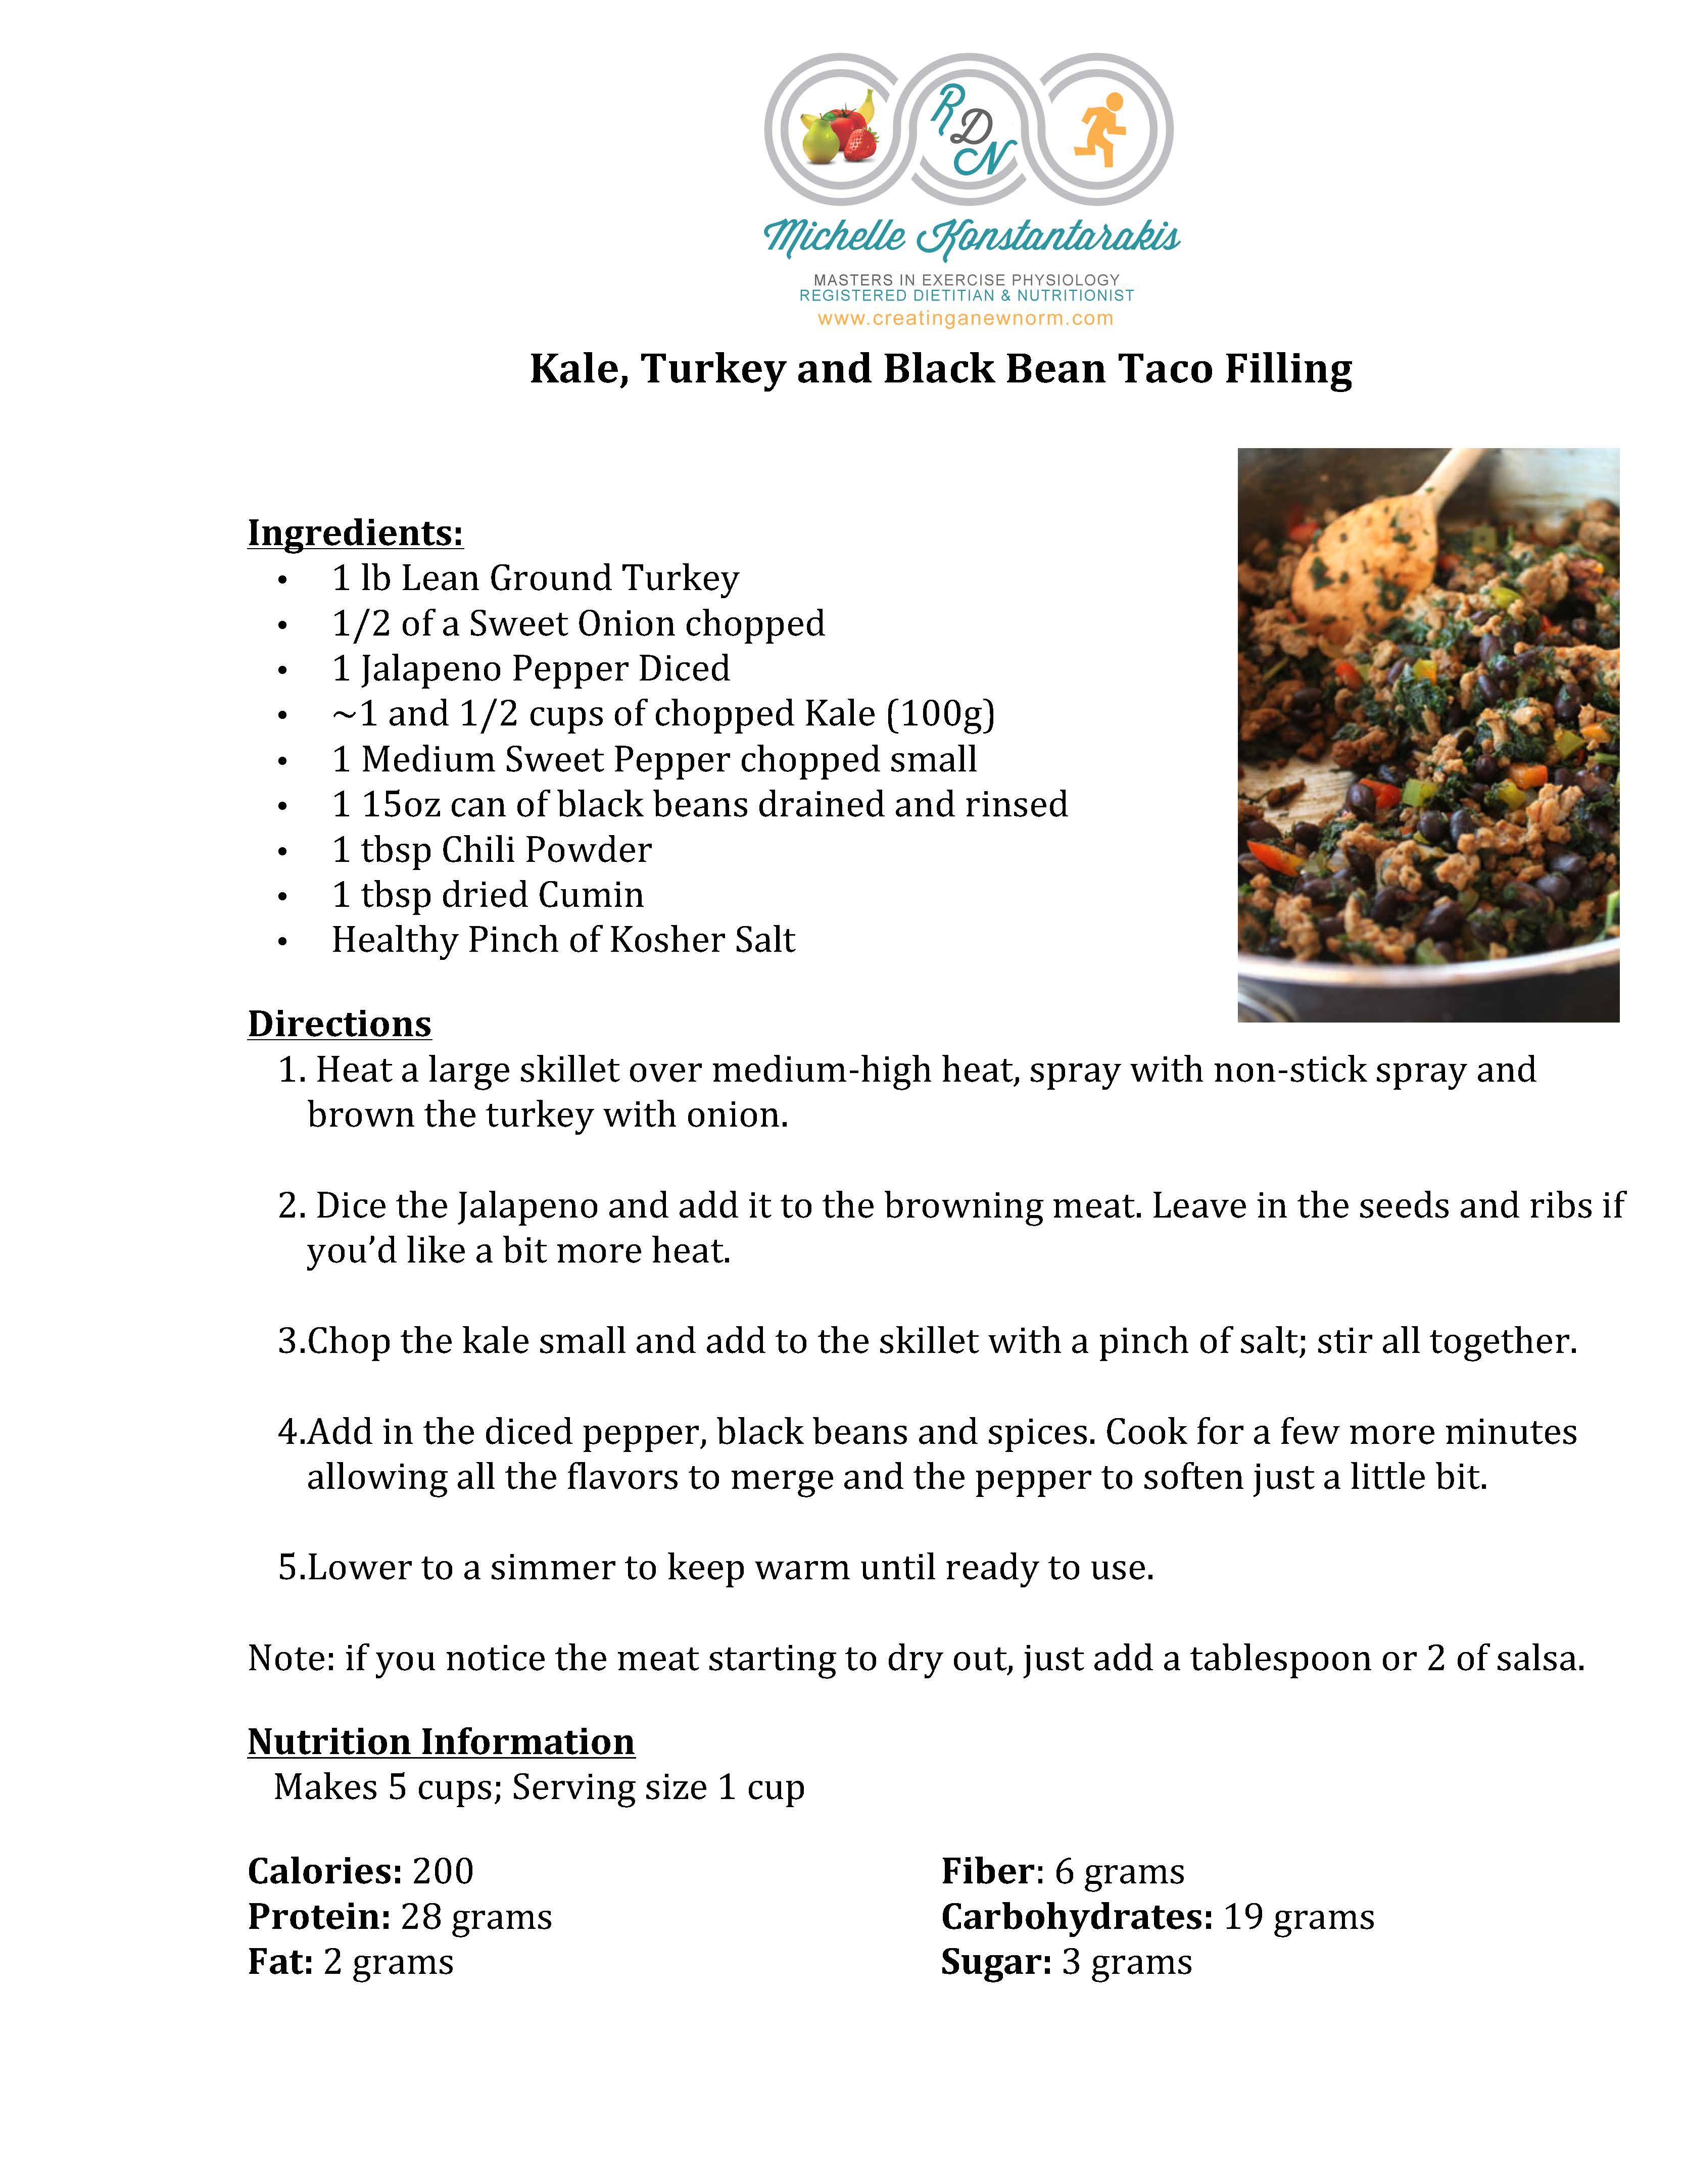 Recipe_Kale_Turkey_and_Black_Bean_Taco_Filling_